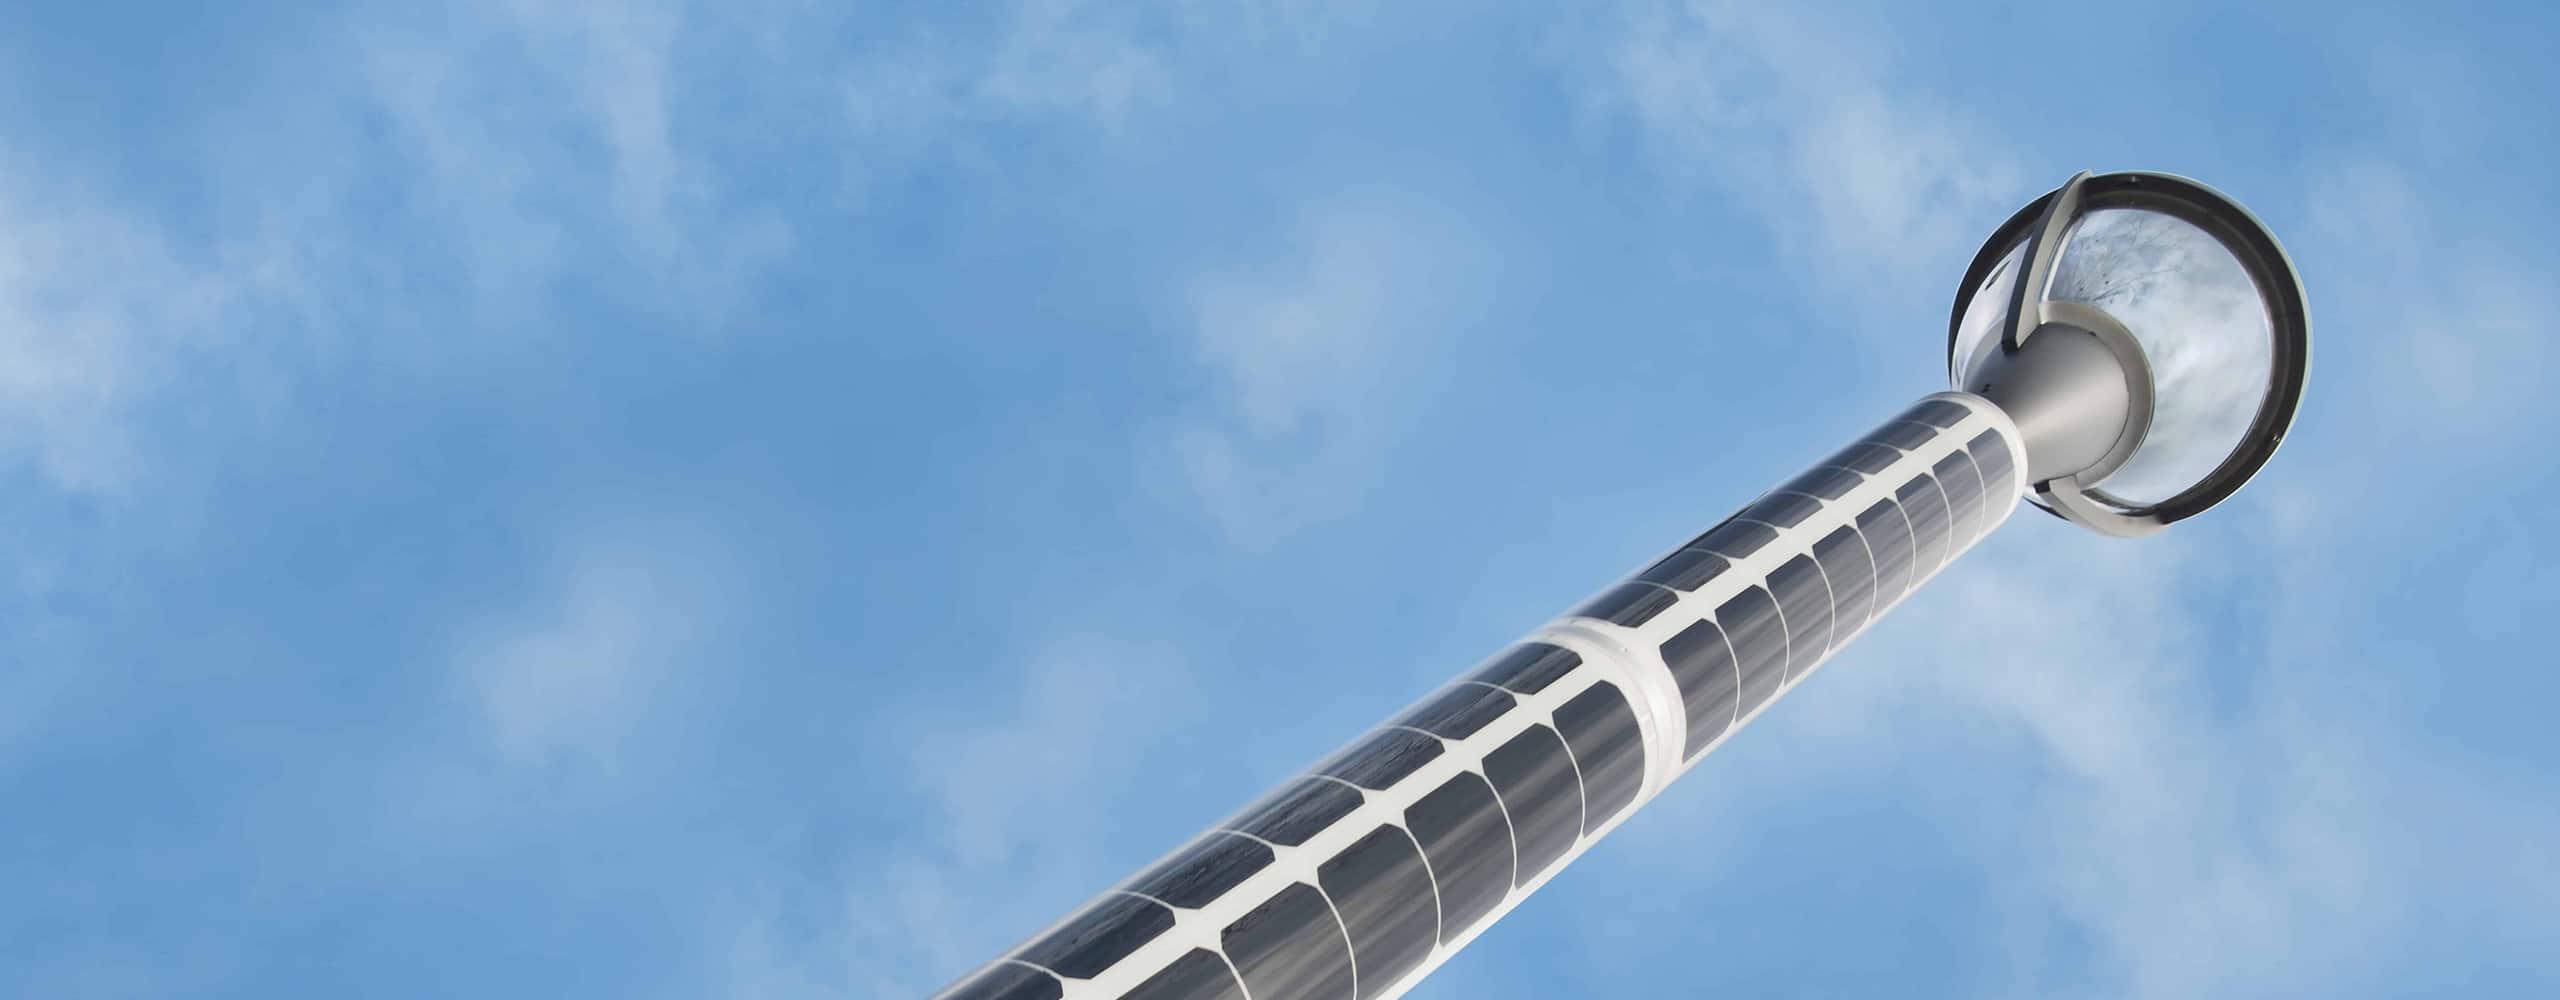 Solar light pole - Soluxio smart solar street light